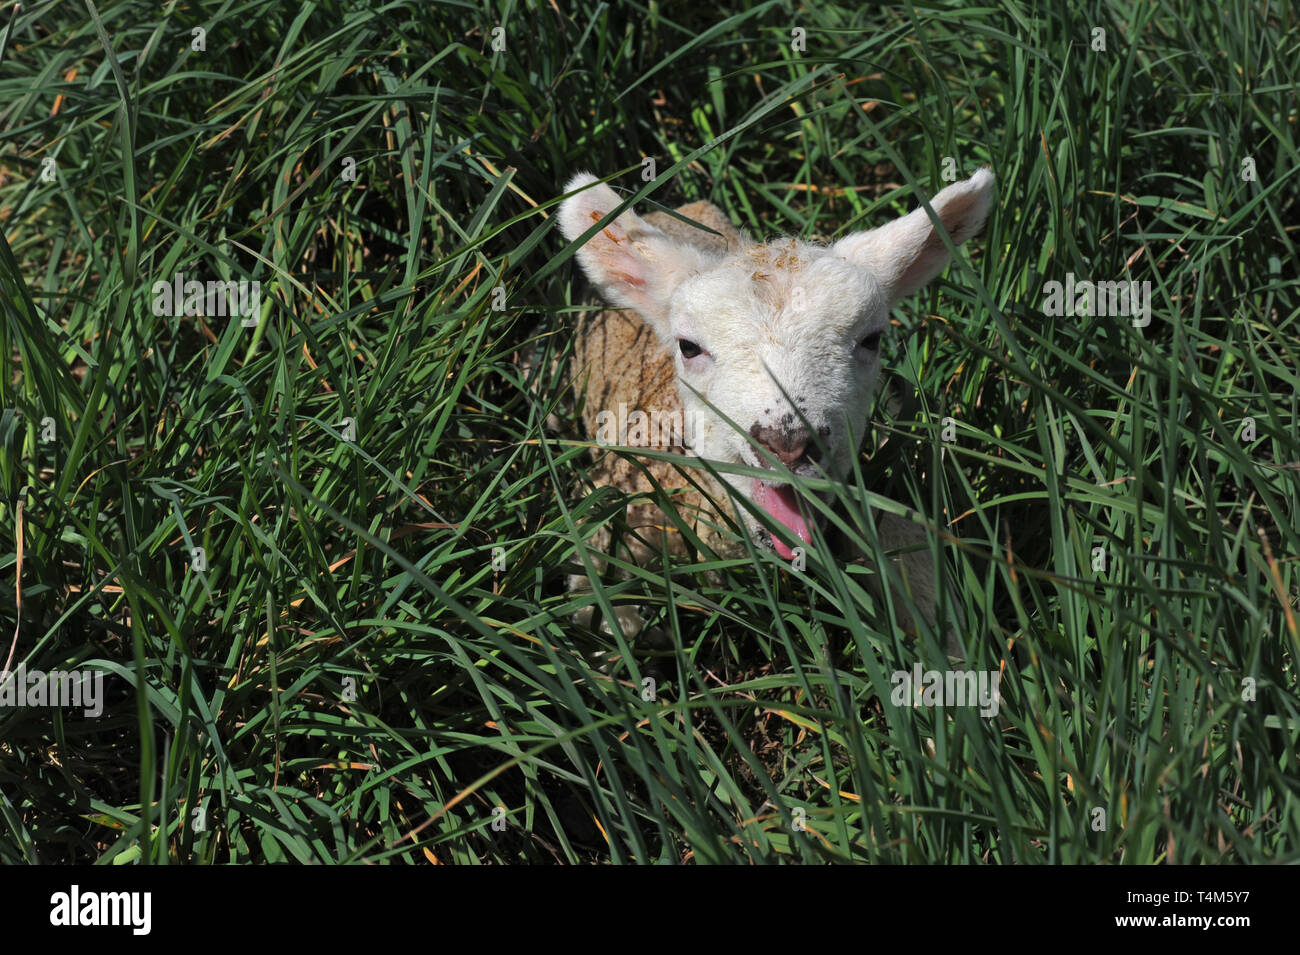 Neugeborene Lamm in der Wiese Stockbild